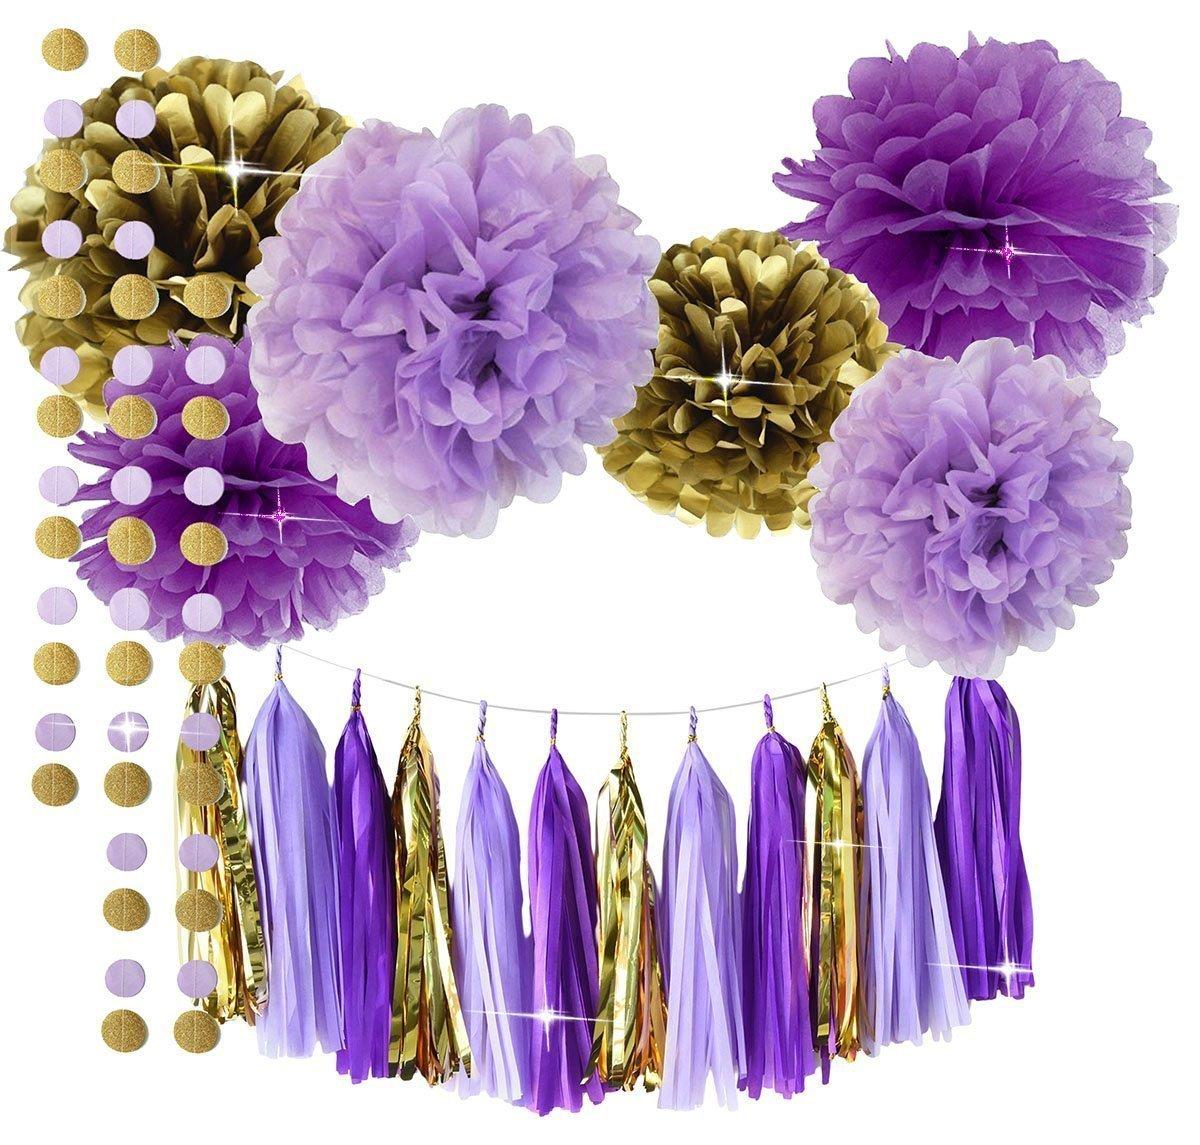 kumeed 12 white dark purple gold confetti balloons latex balloon globos party. Black Bedroom Furniture Sets. Home Design Ideas